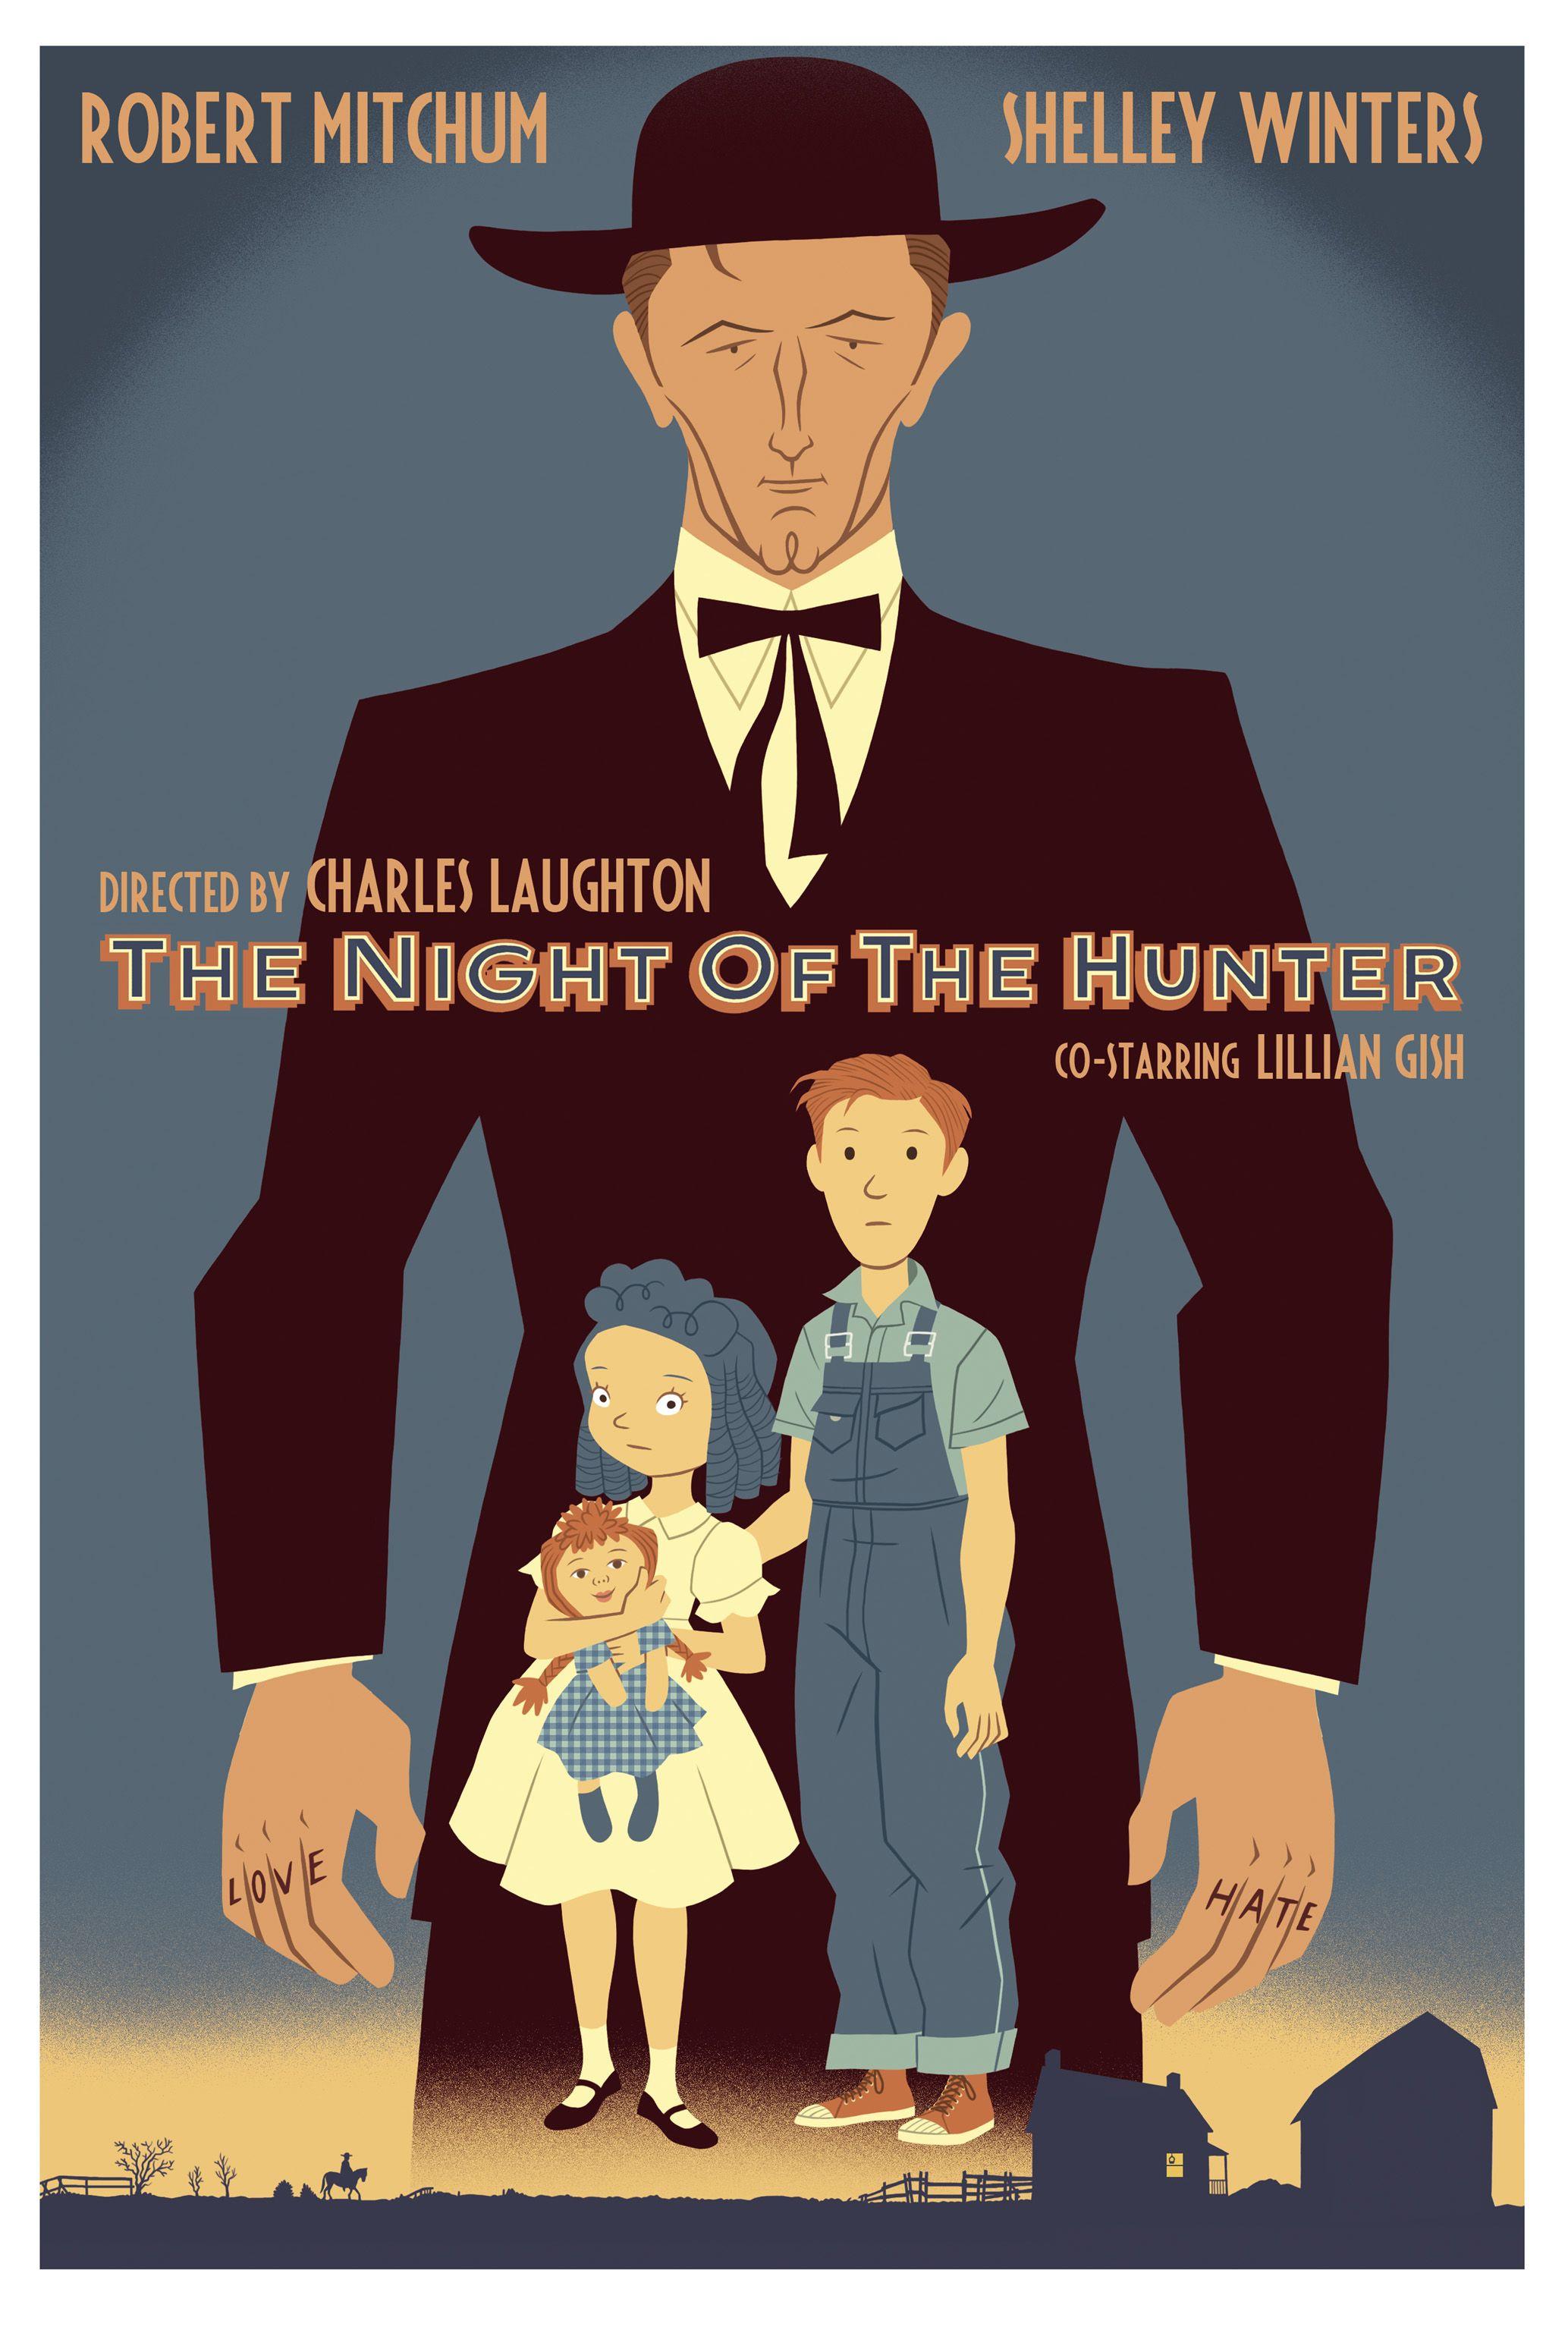 The Night of the Hunter poster. Alternative movie